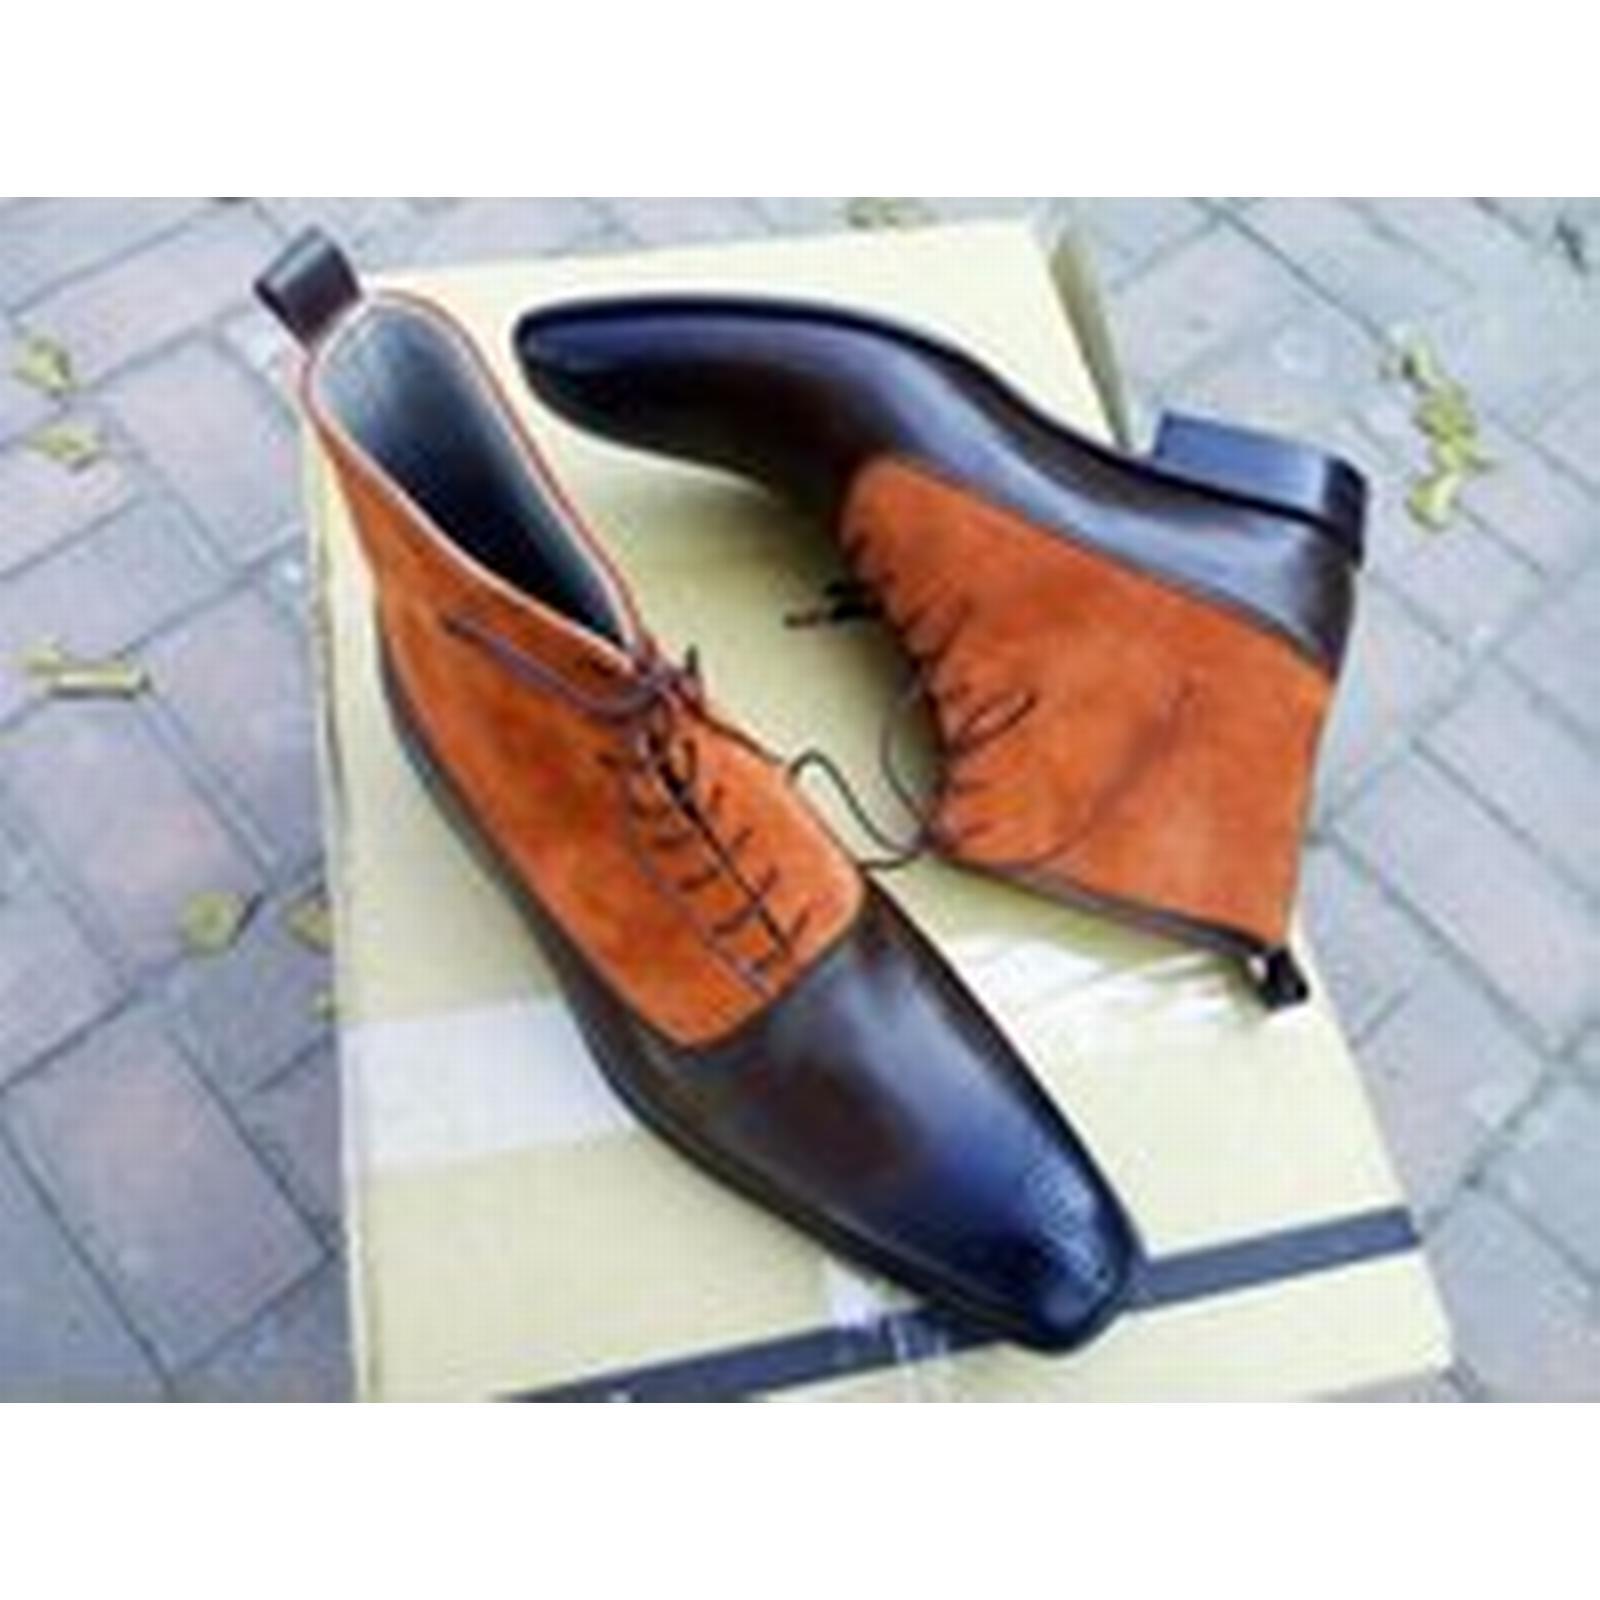 Bonanza (Global) Handmade Brown Men Ankle Boot Brown Handmade Tan Suede & Leather Shoes Dress Formal Denim Boot 40b1b0